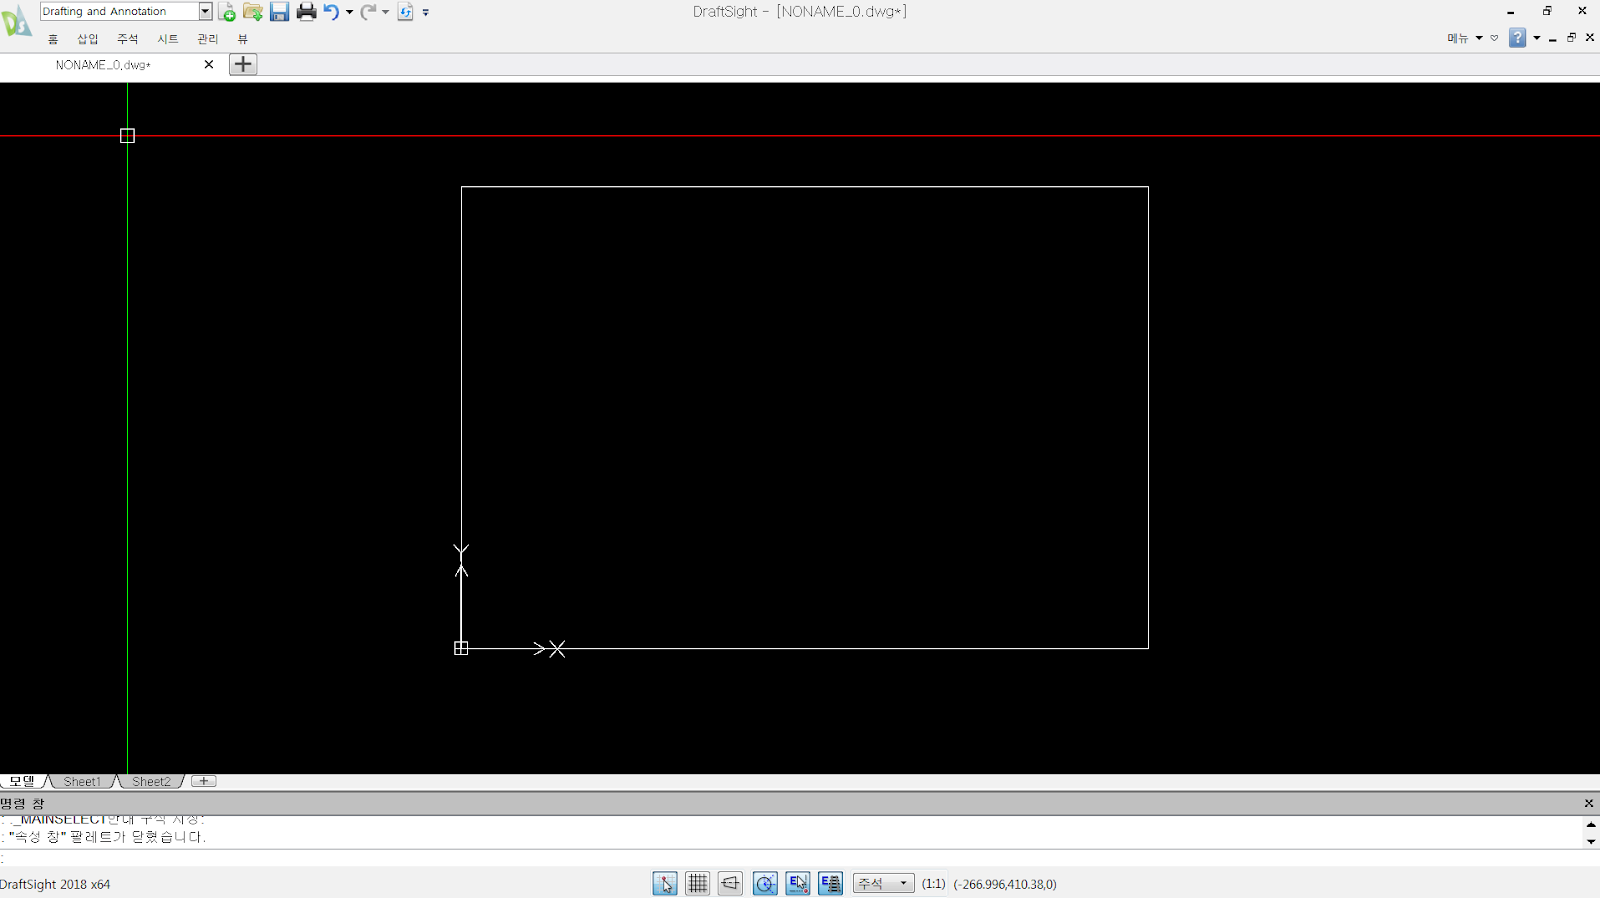 Draftsight 화면설정 - 아이콘 크기 변경 및 Classic 화면 설정